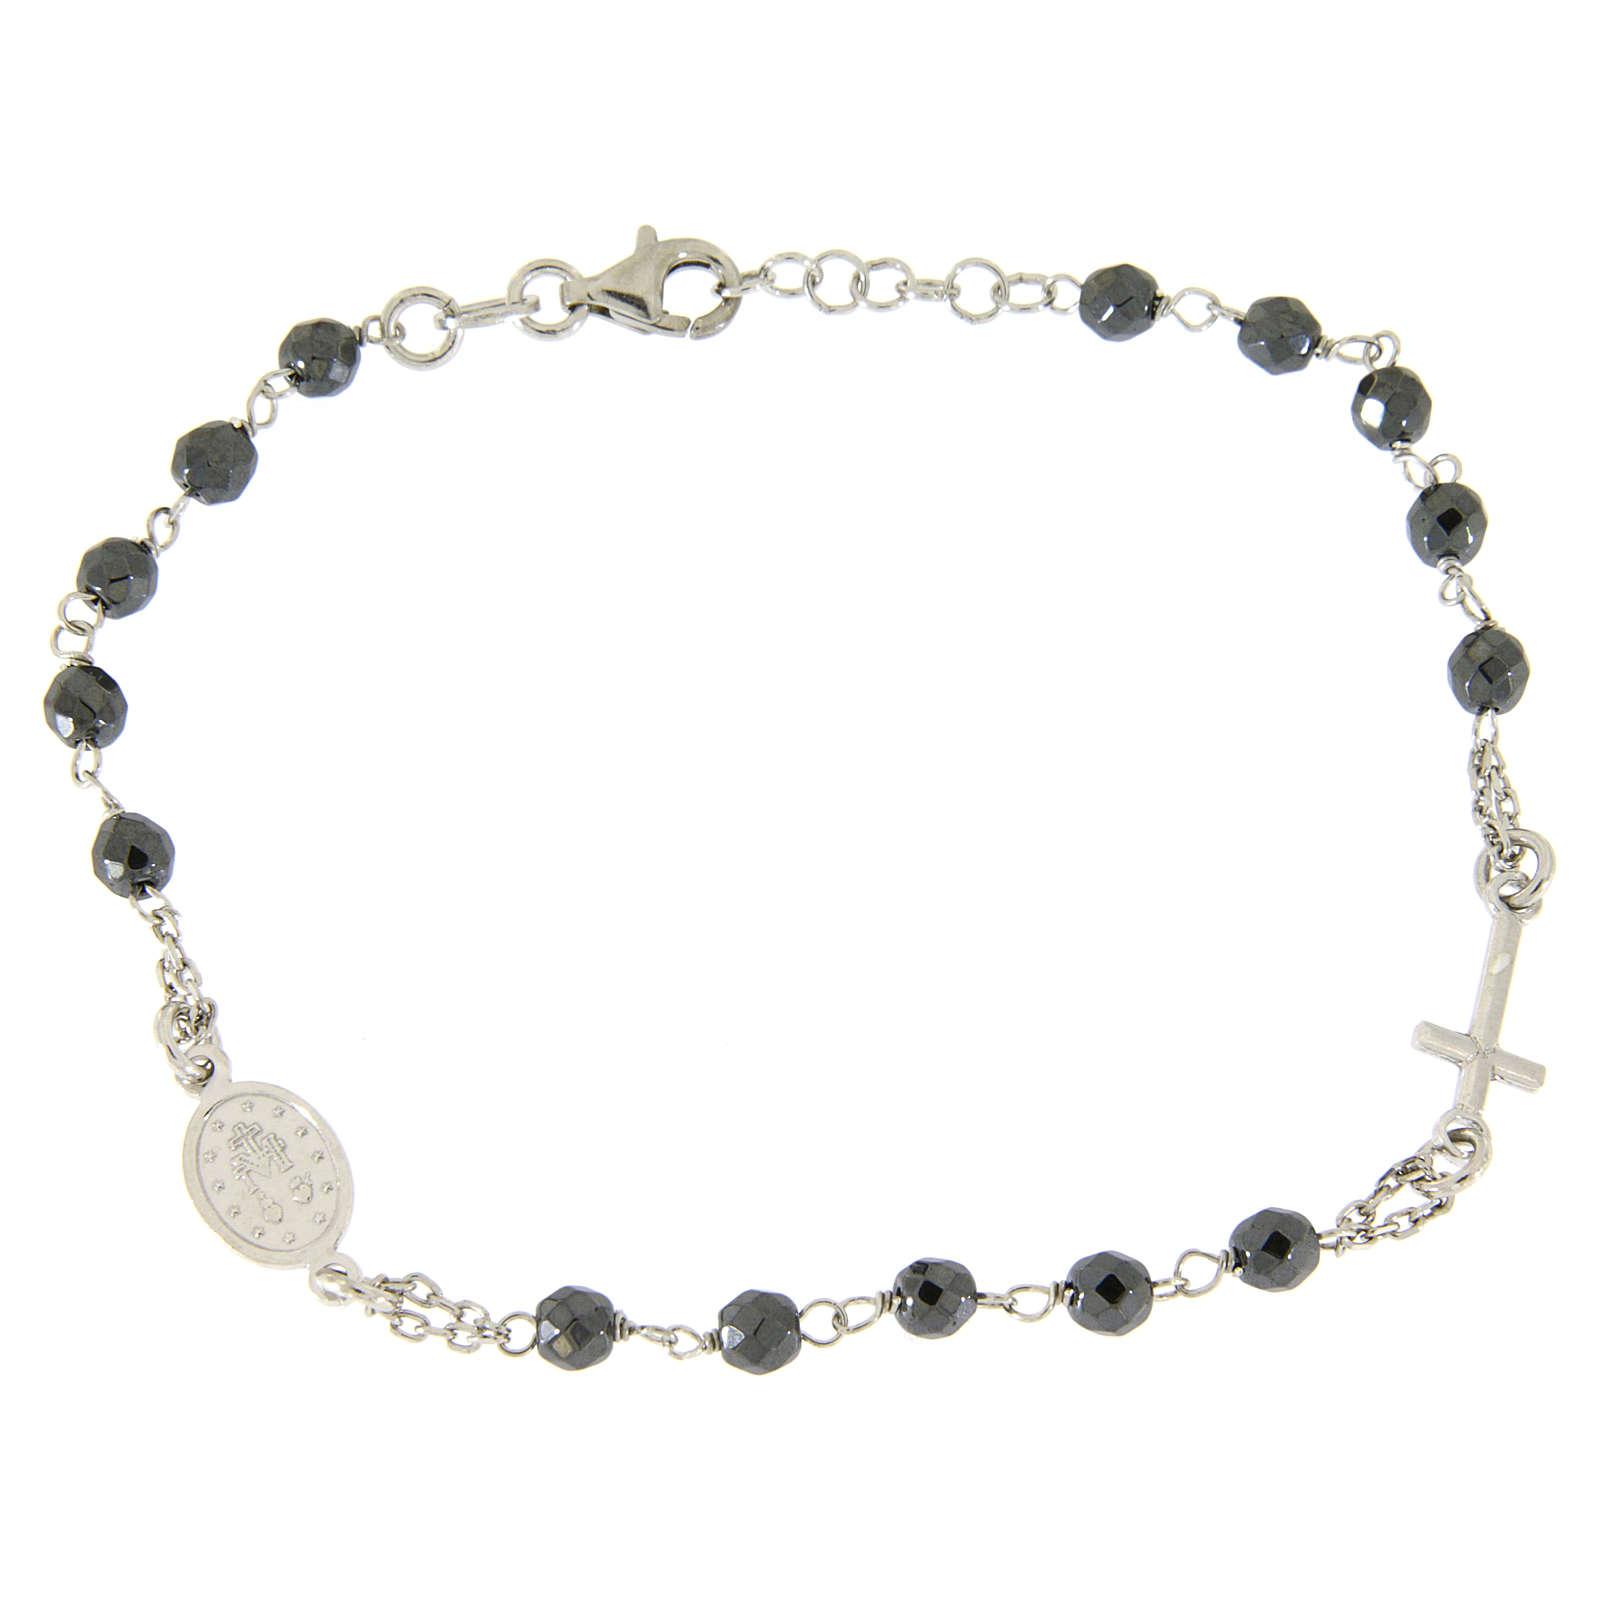 Bracciale rosario grani 4,7 mm ematite e catenina argento 4